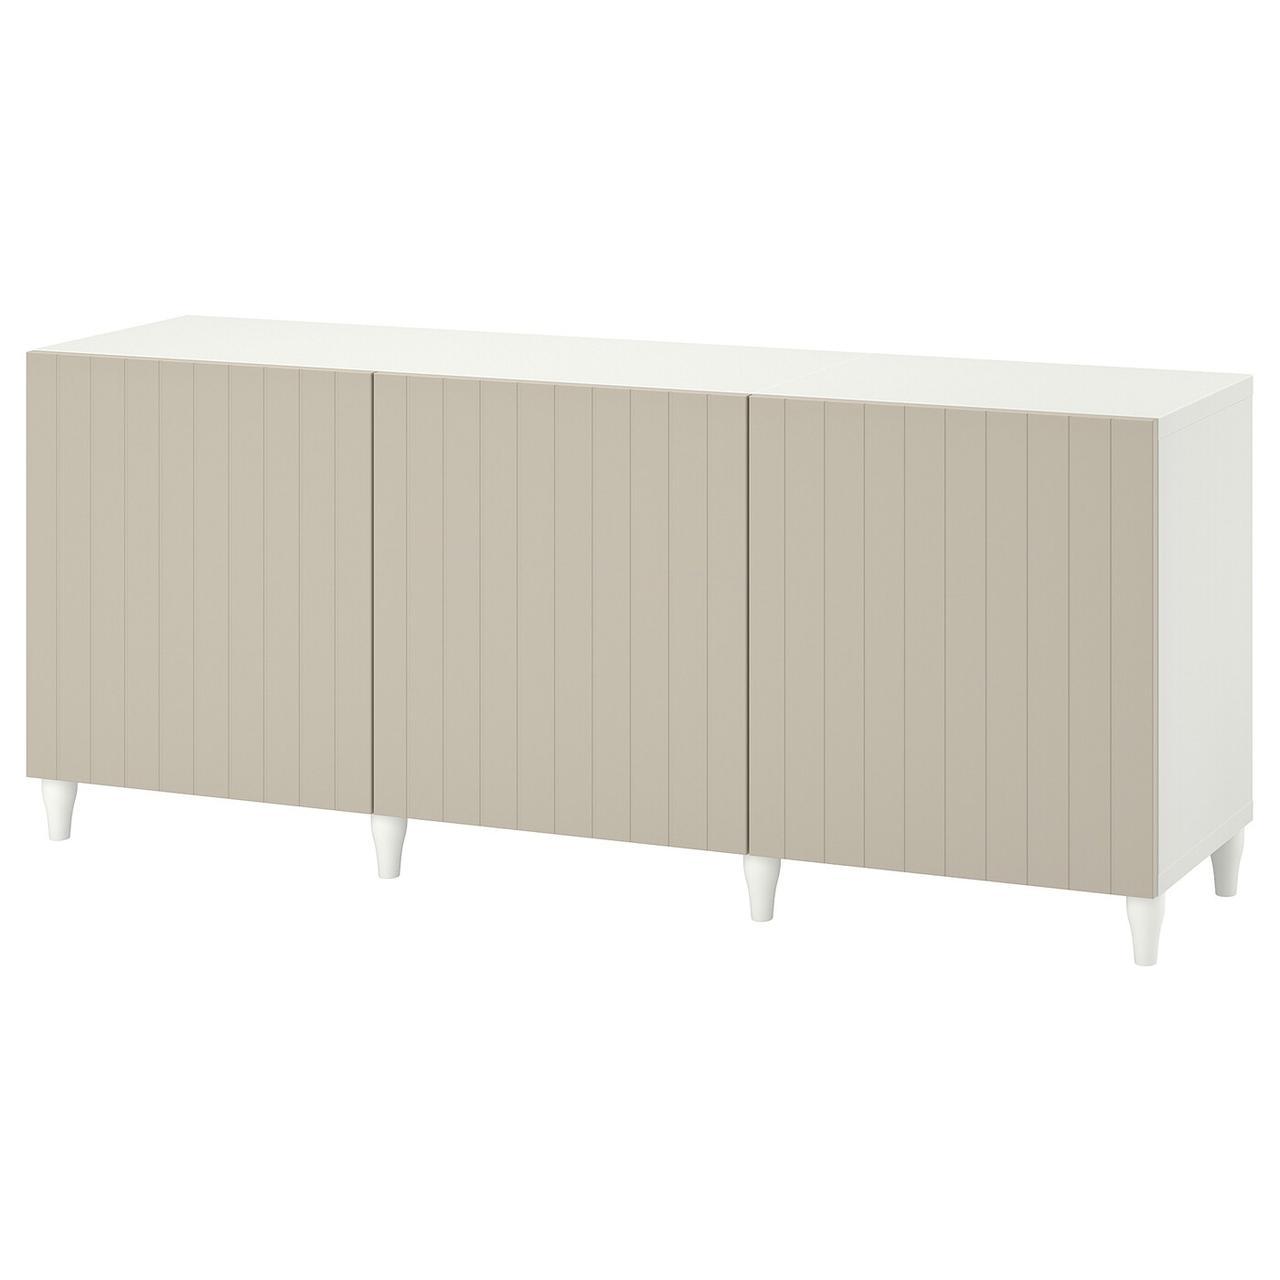 IKEA BESTÅ Комбінація з дверцятами білий/Sutterviken/Kabbarp szarobeżowy 180x42x74 см